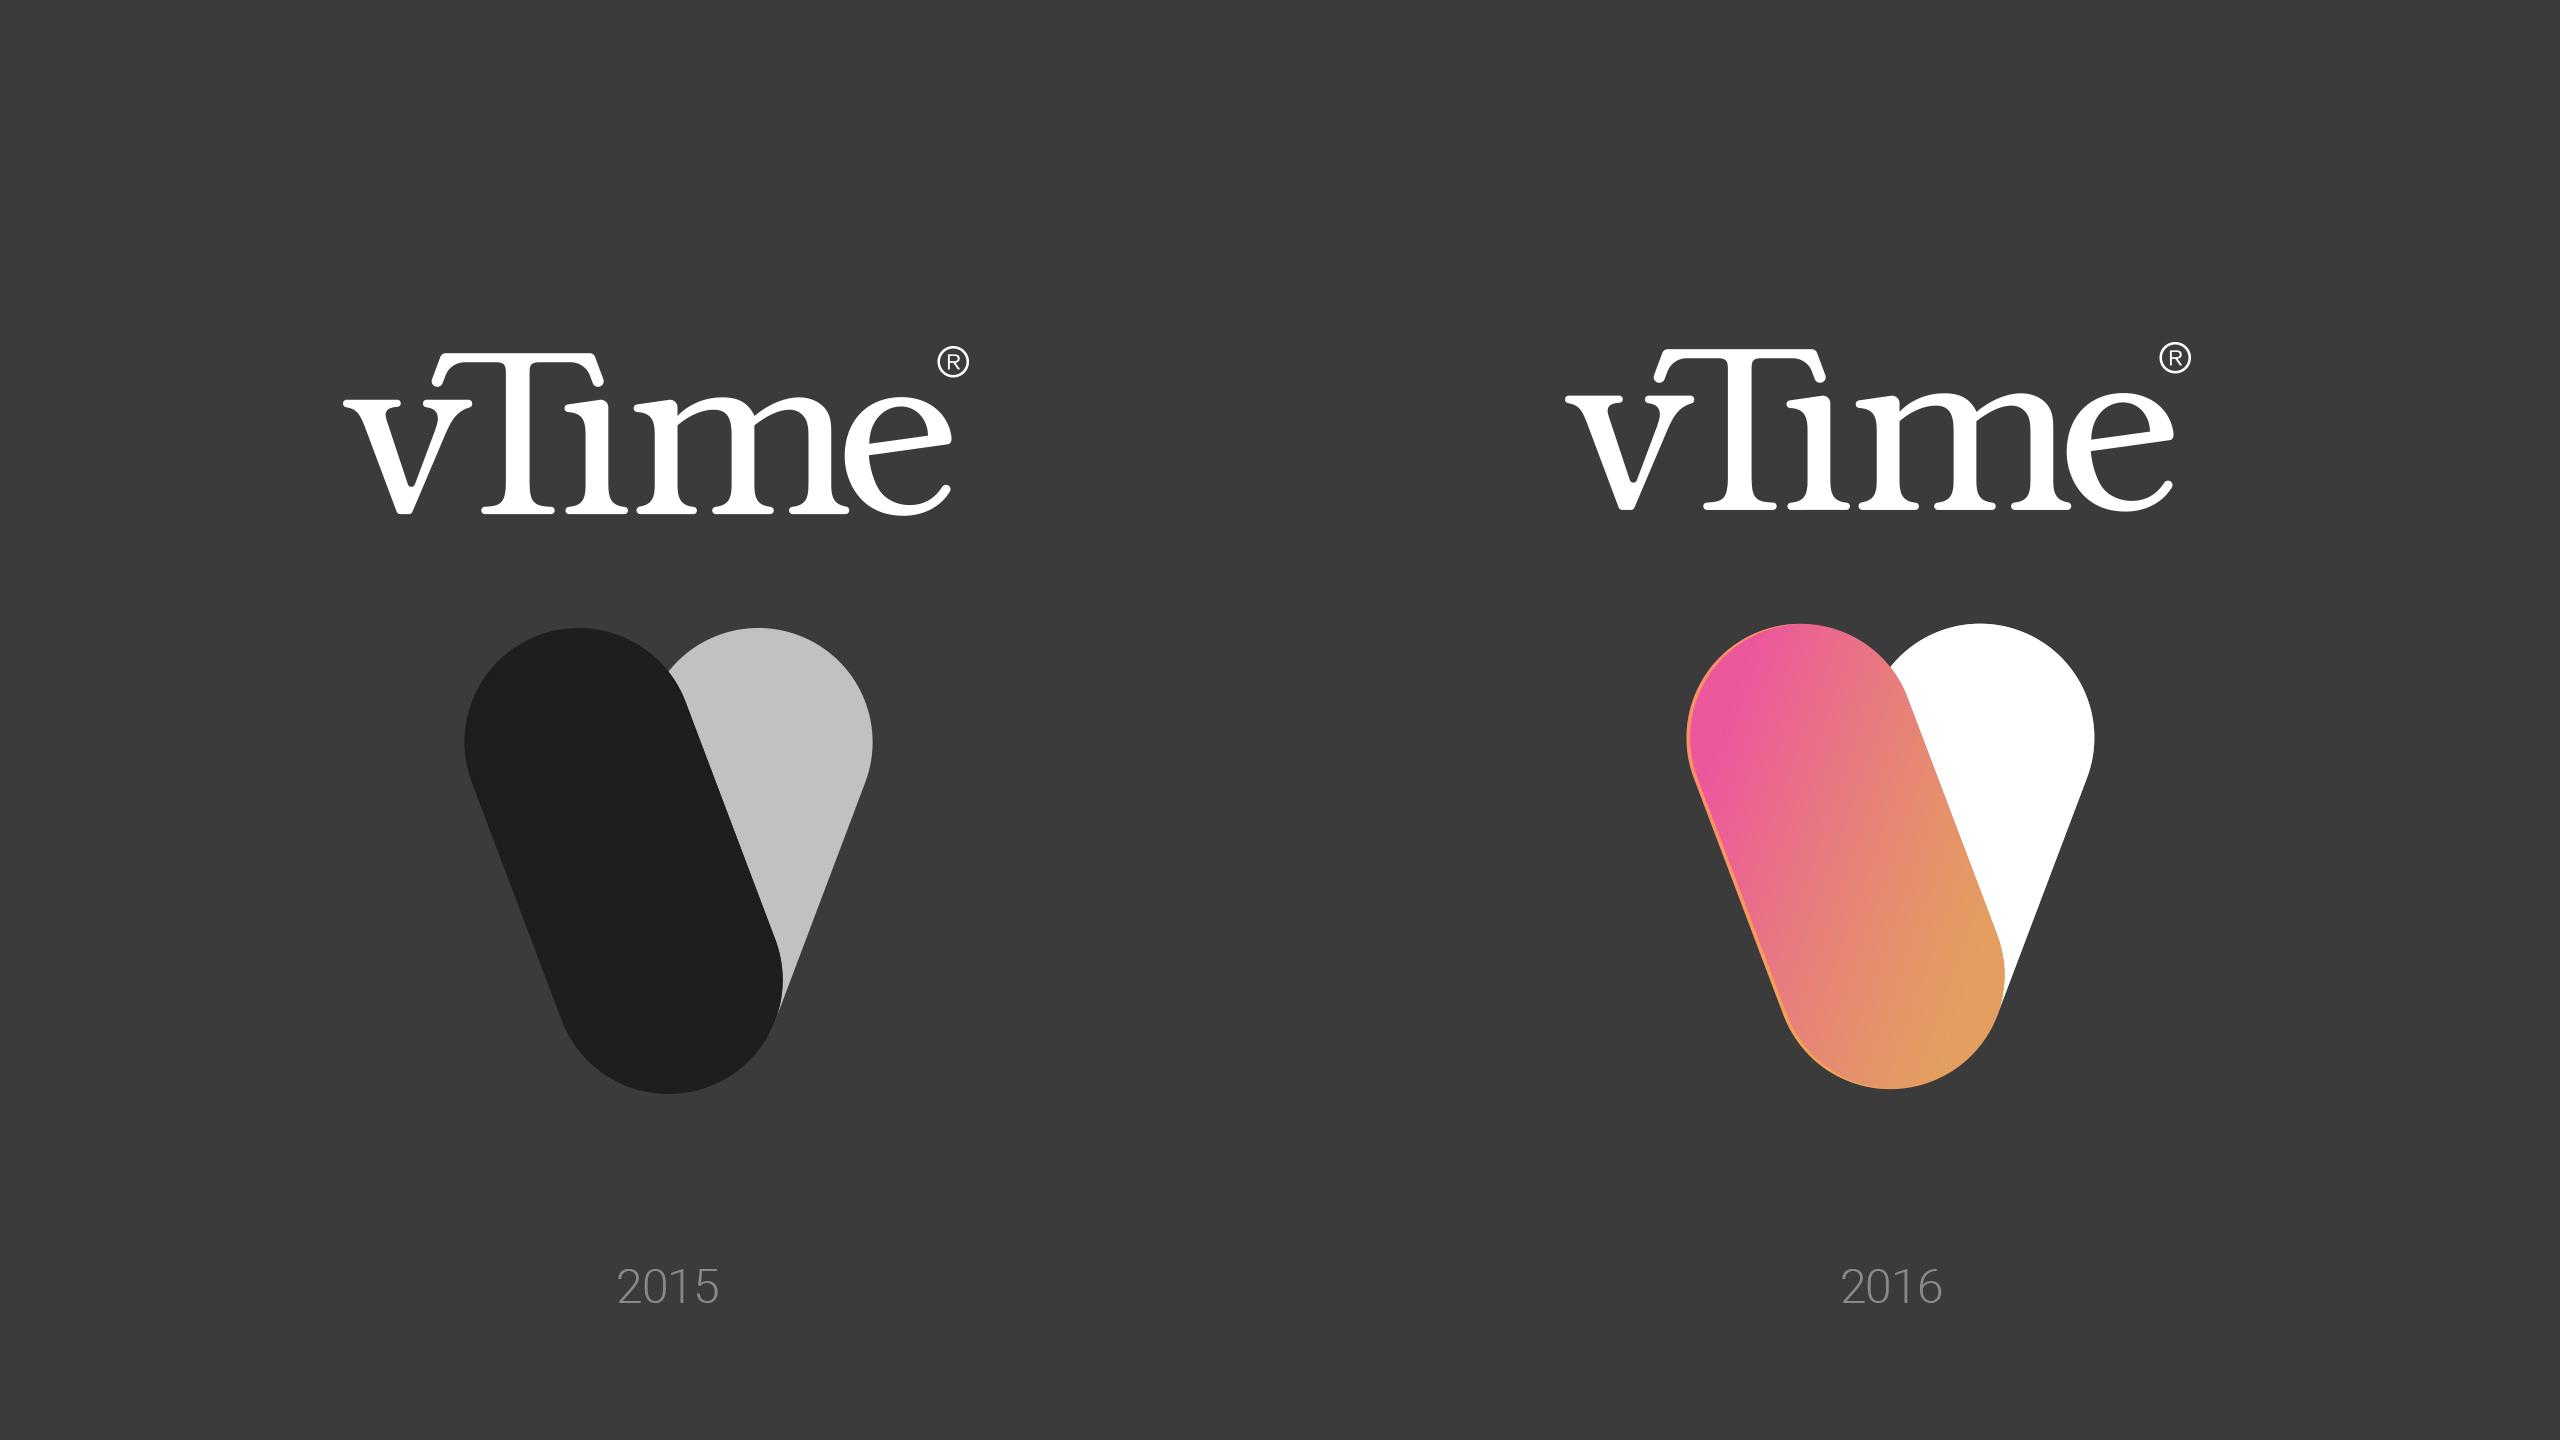 Vtime Logo Then Now